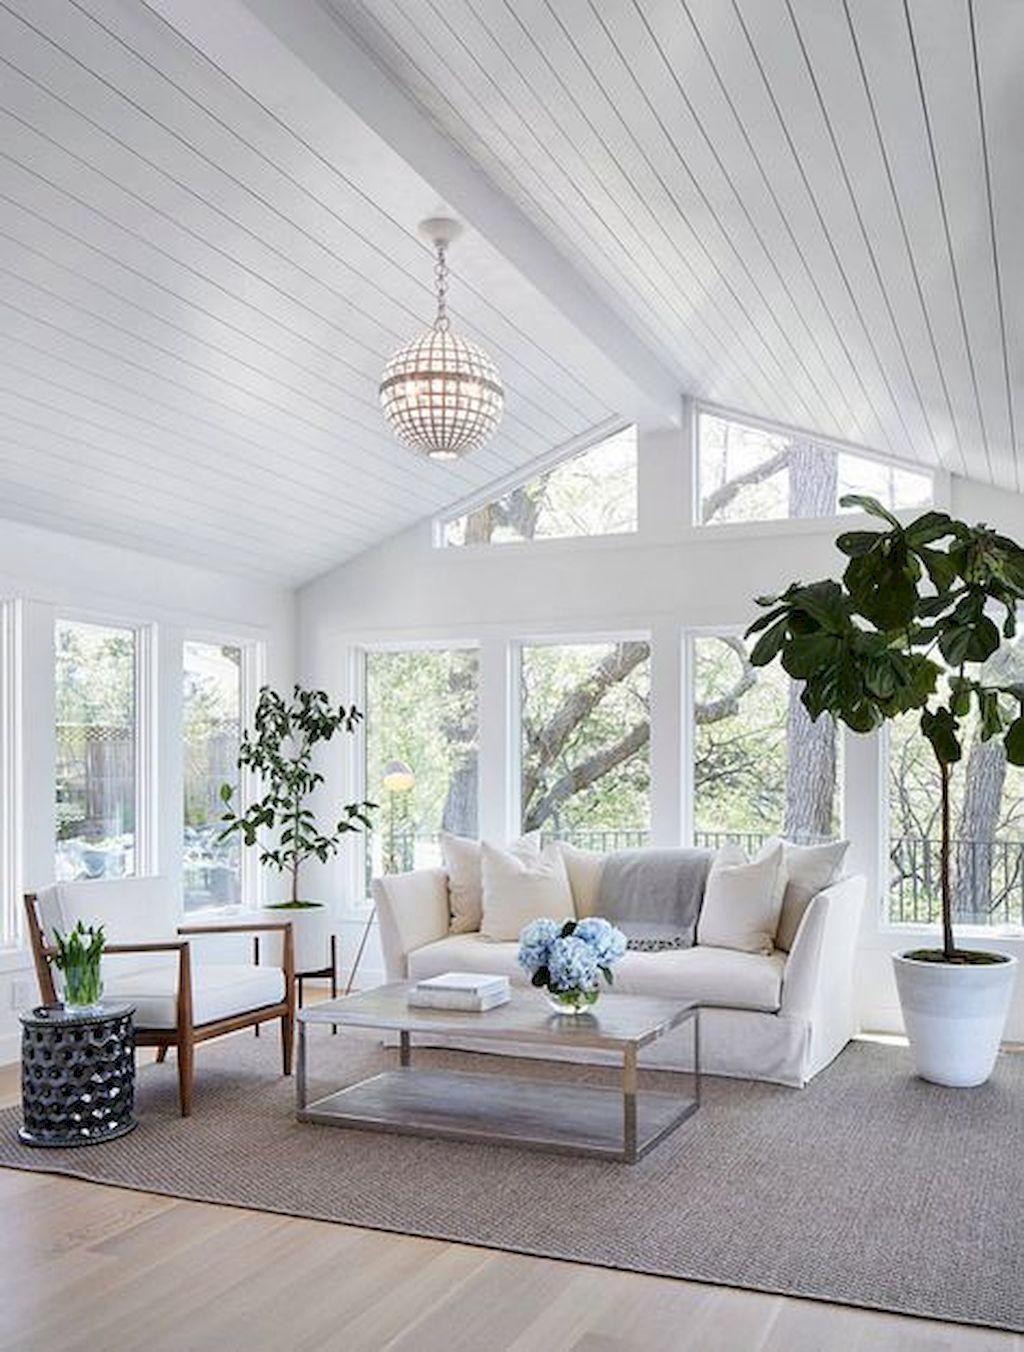 75 Romantic Shabby Chic Living Room Decor Ideas | Shabby chic living ...